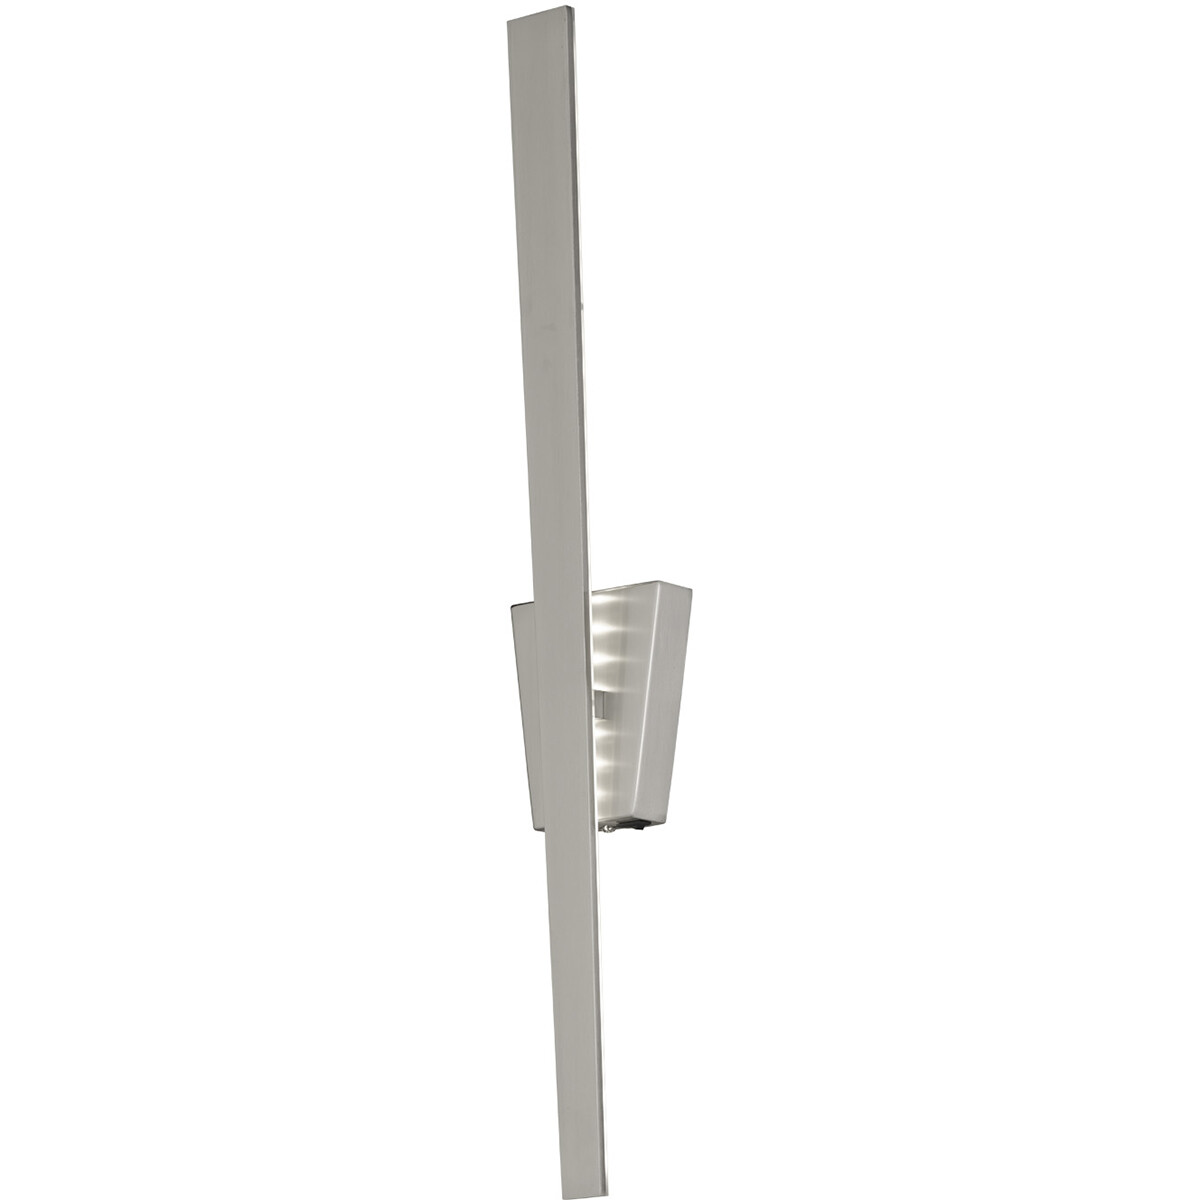 LED Wandlamp - Wandverlichting - Trion Zitana - 6W - Warm Wit 3000K - Rechthoek - Mat Nikkel - Alumi